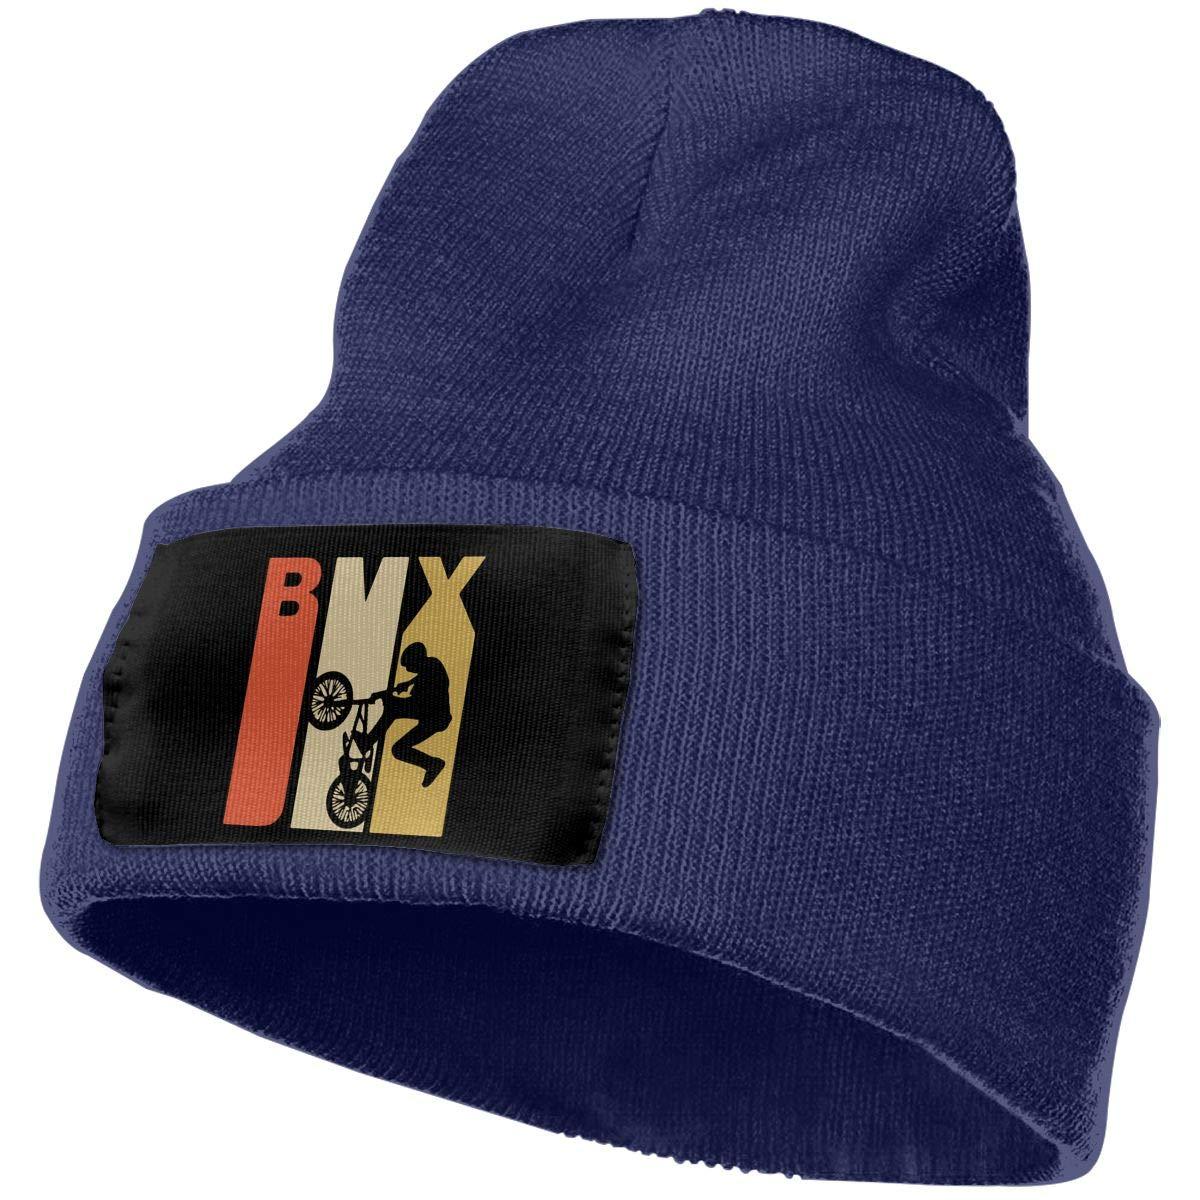 Men /& Women Retro 1970s Style BMX Silhouette Outdoor Stretch Knit Beanies Hat Soft Winter Skull Caps